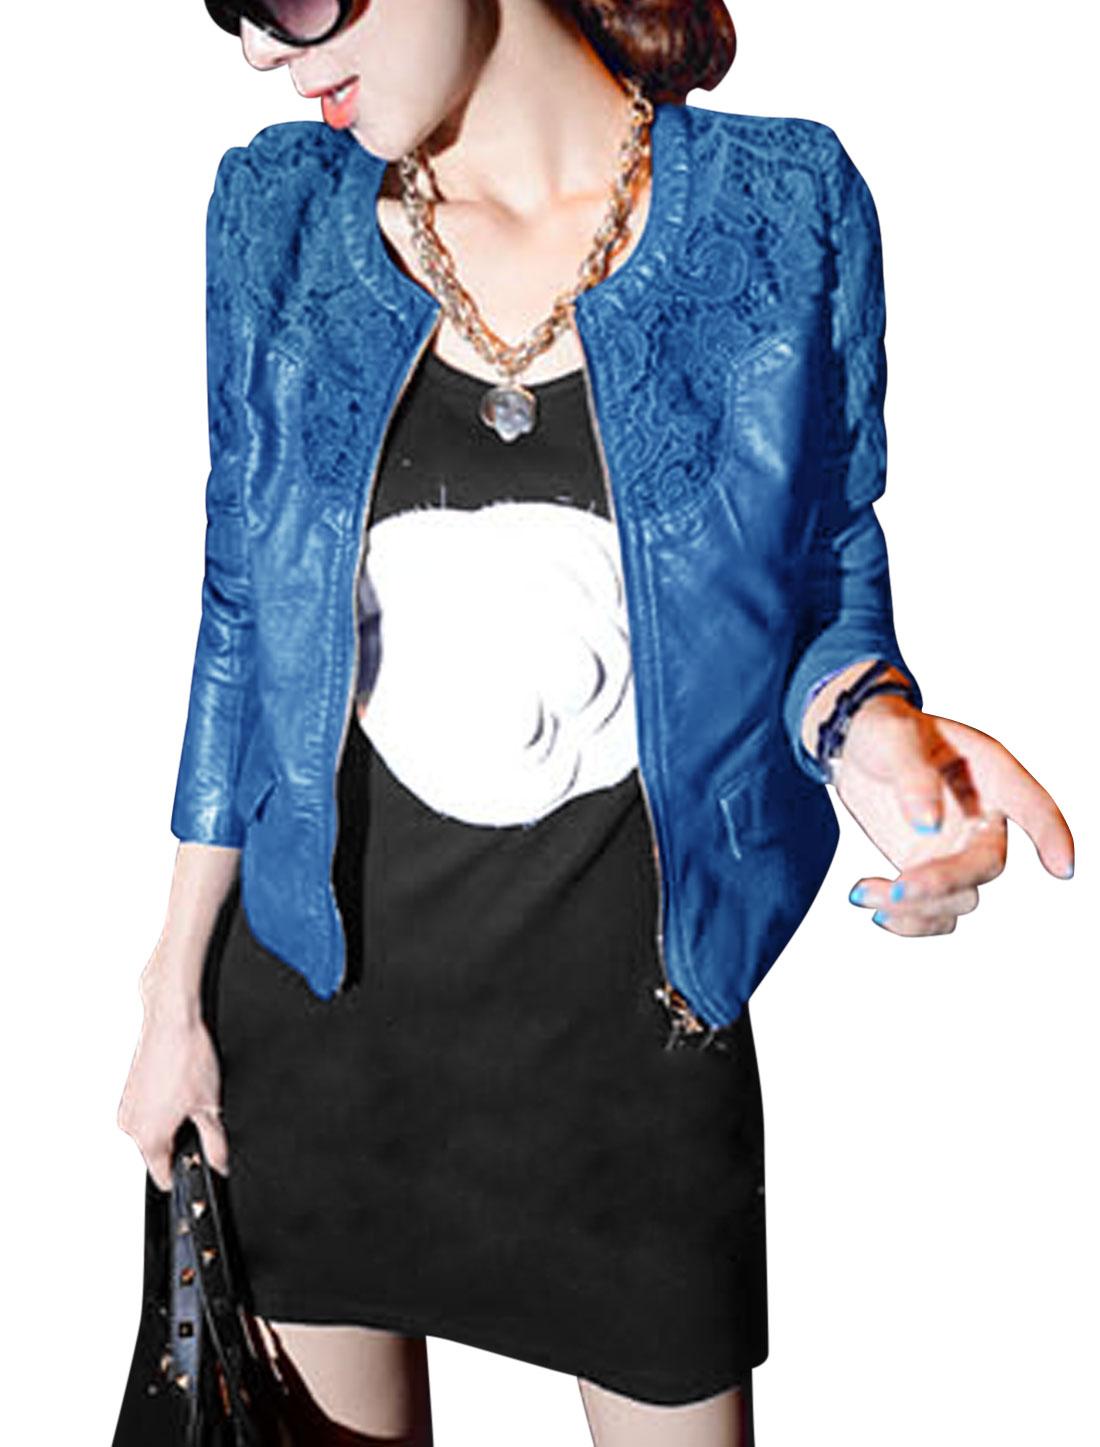 Lady Zip Up Crochet Panel Casual Imitation Leather Jacket Royal Blue M